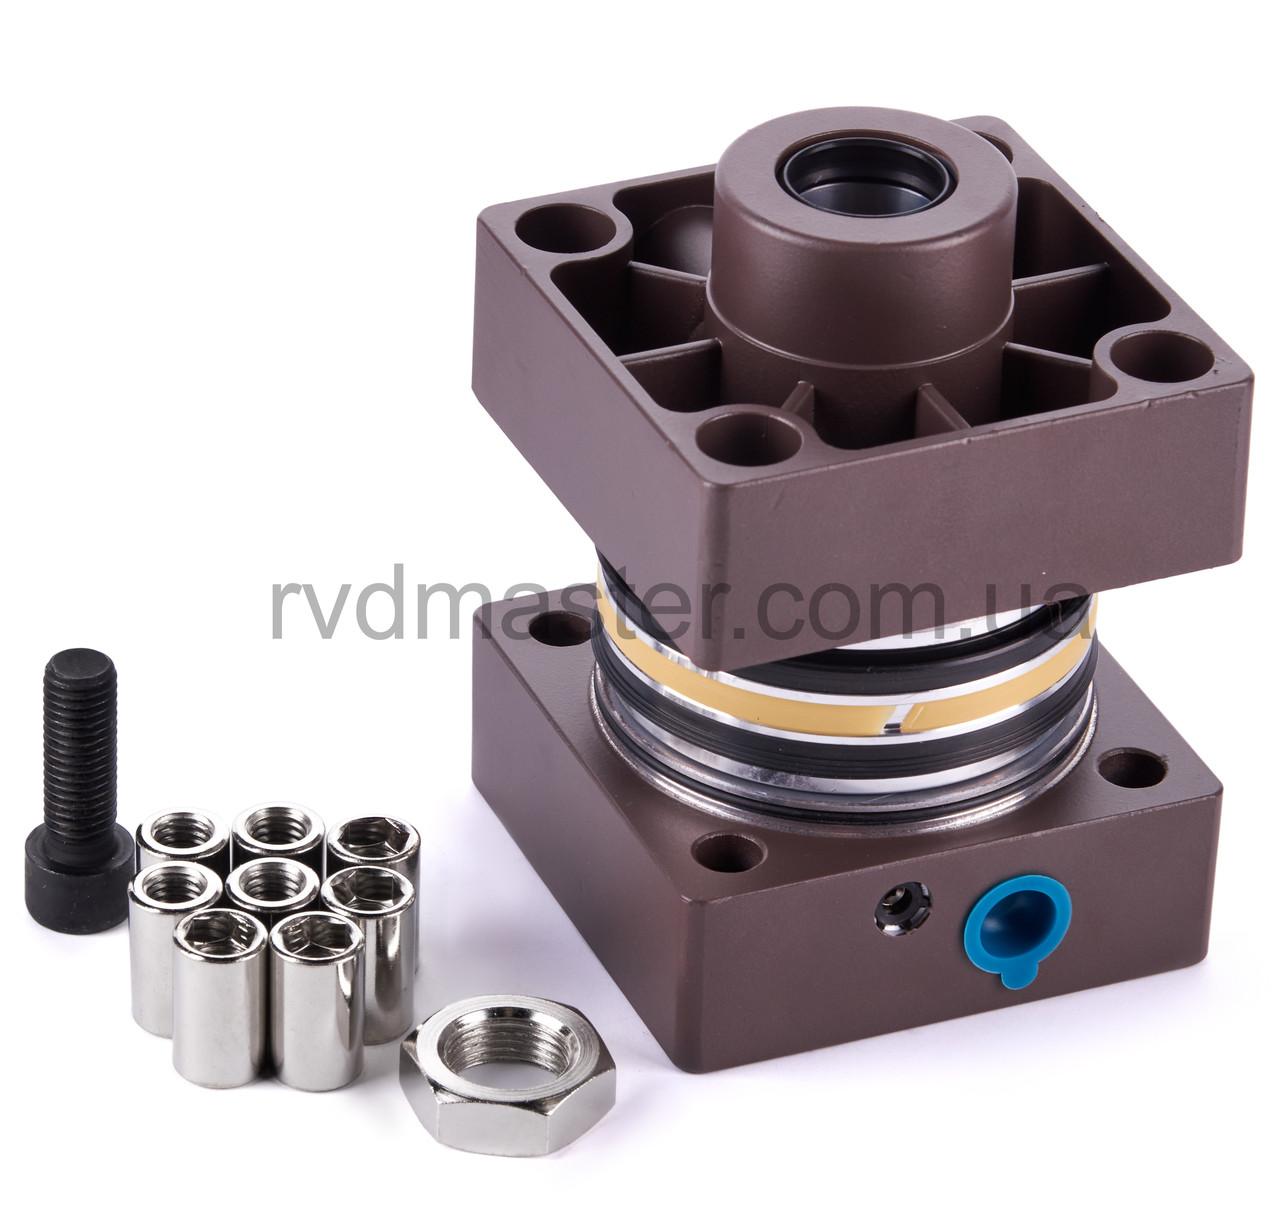 Комплект для сборки пневматического цилиндра диаметром поршня 32mm